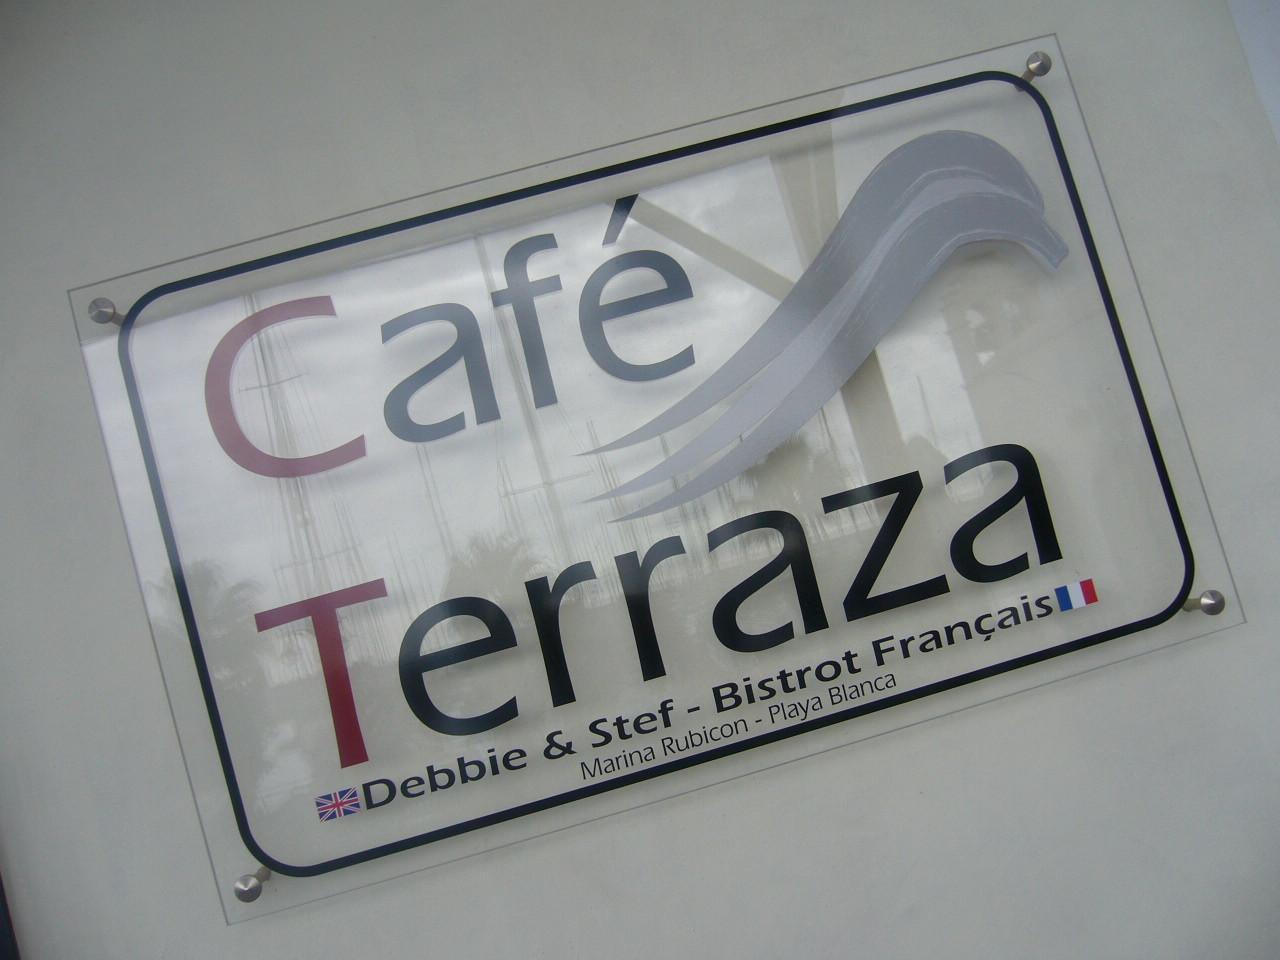 Uk Spain Café Terraza